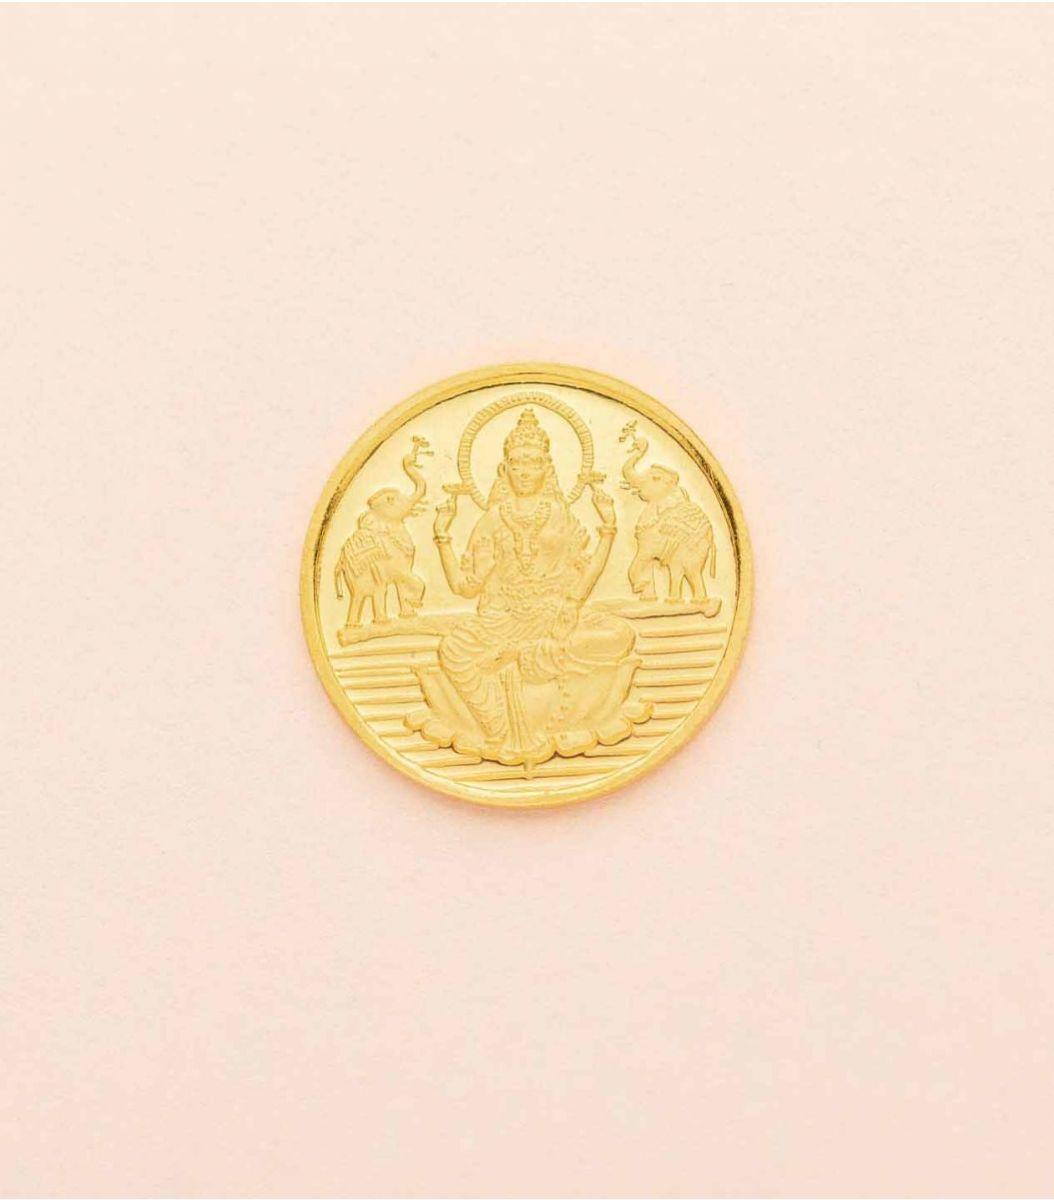 Gold Laxmi Coin-2GM